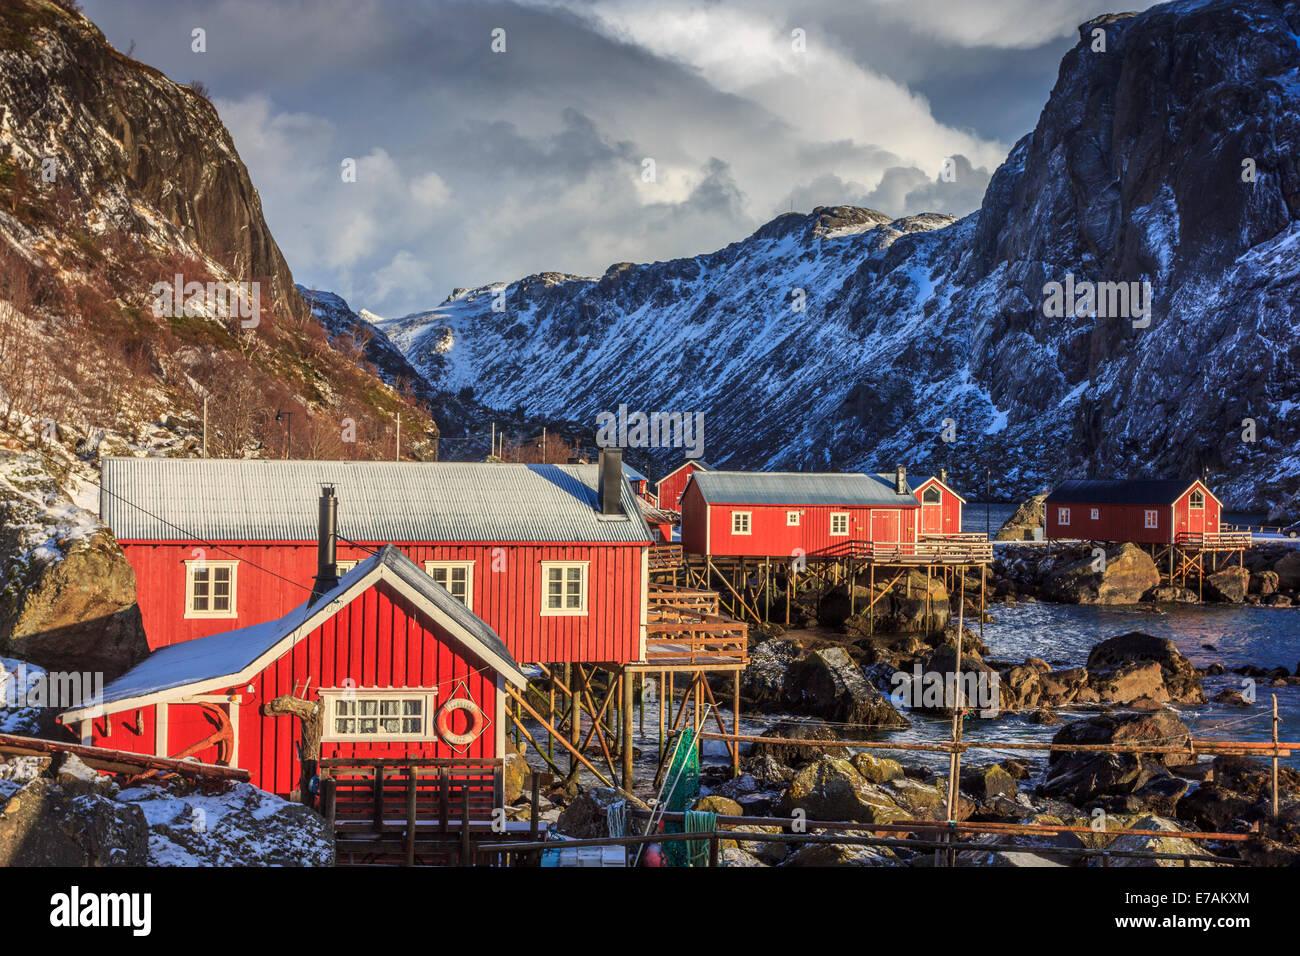 Fishing village in the Lofoten Islands - Stock Image